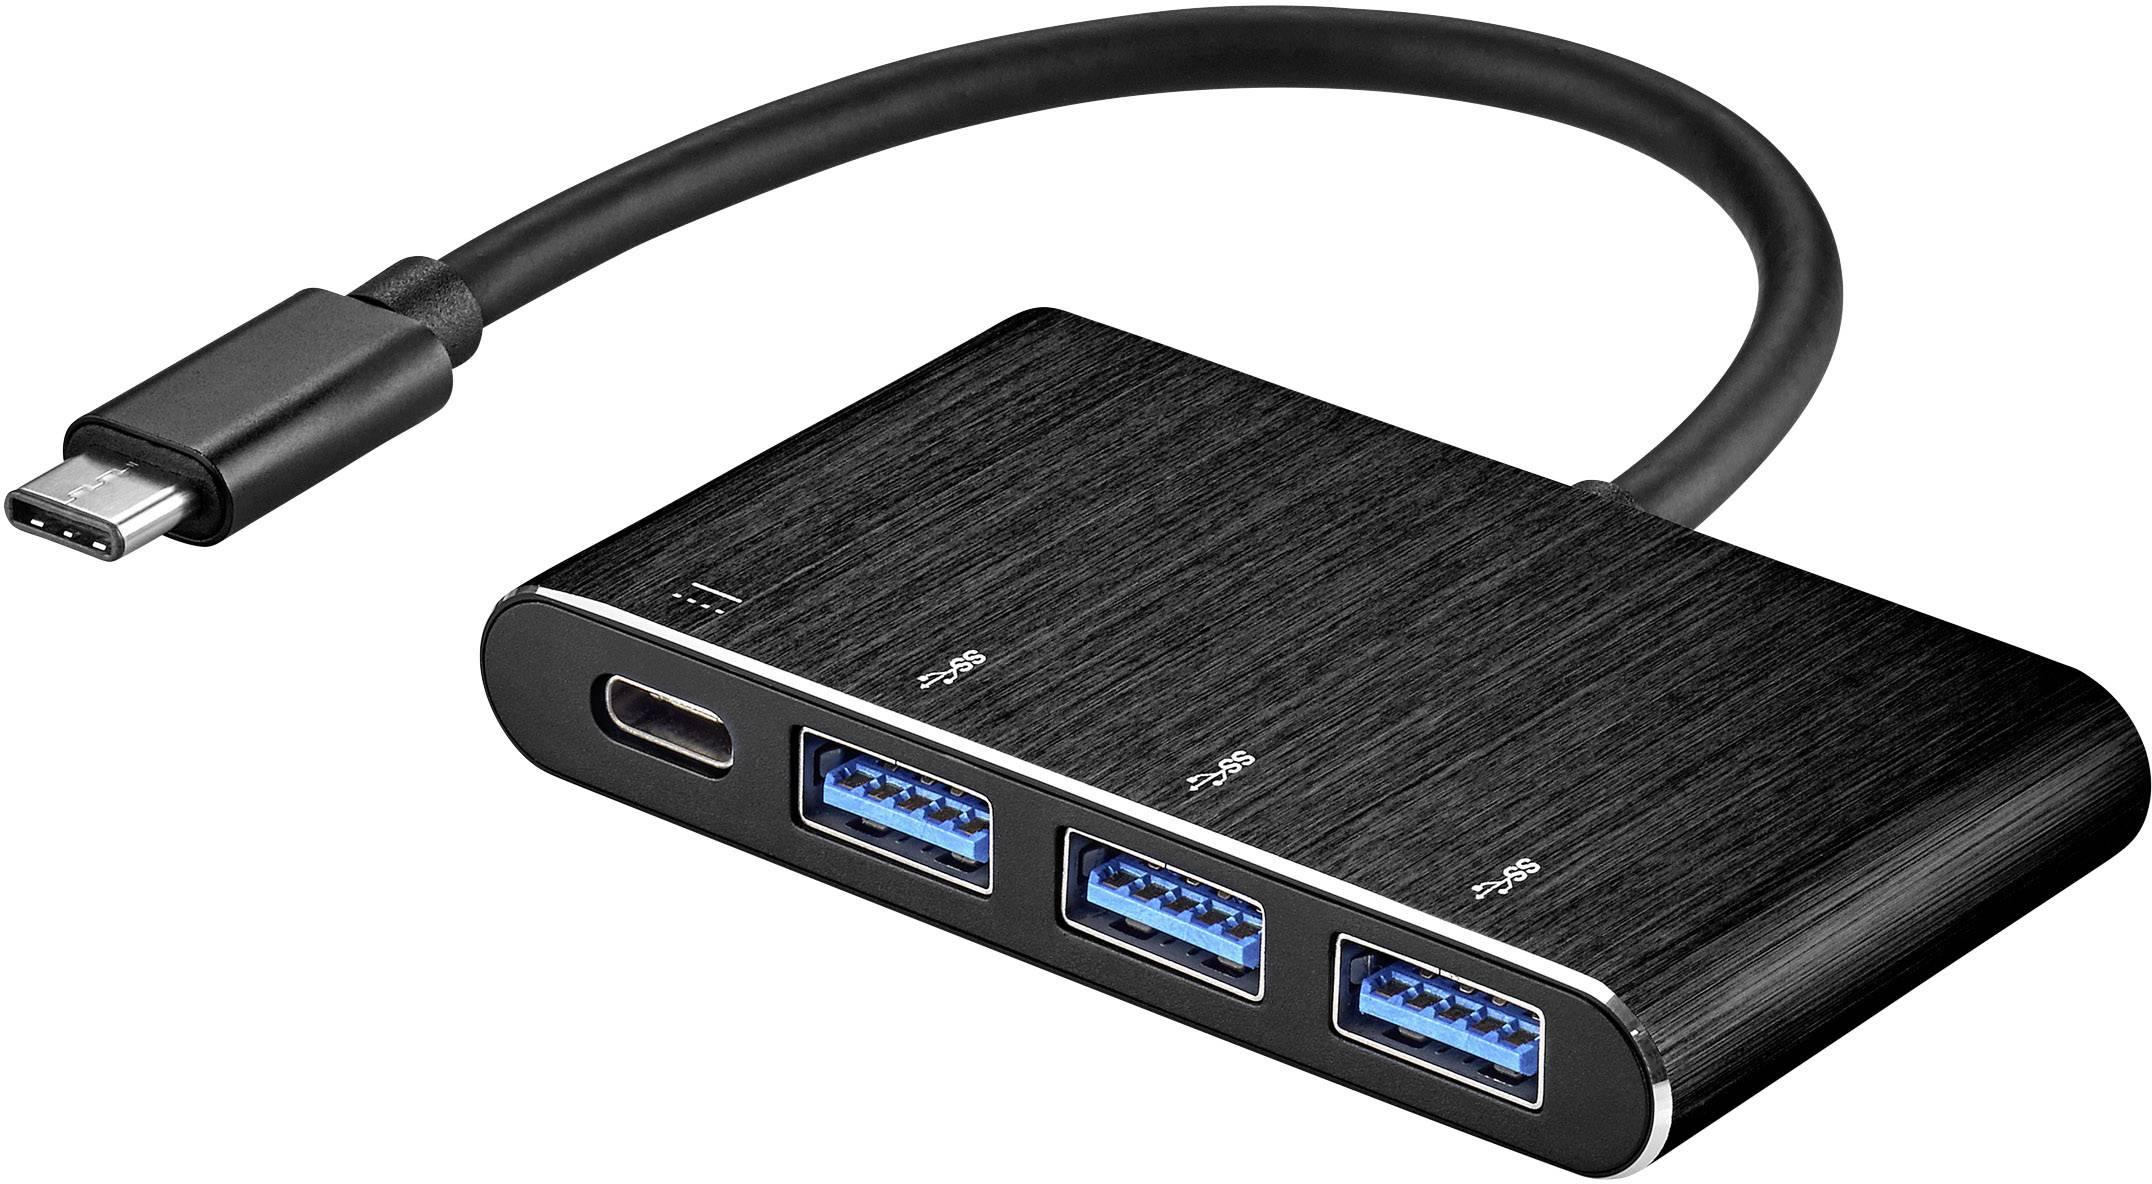 USB 3.0 hub Renkforce rf-USBH-01, s 3 portmi, s funkciou OTG, 37 mm, čierna